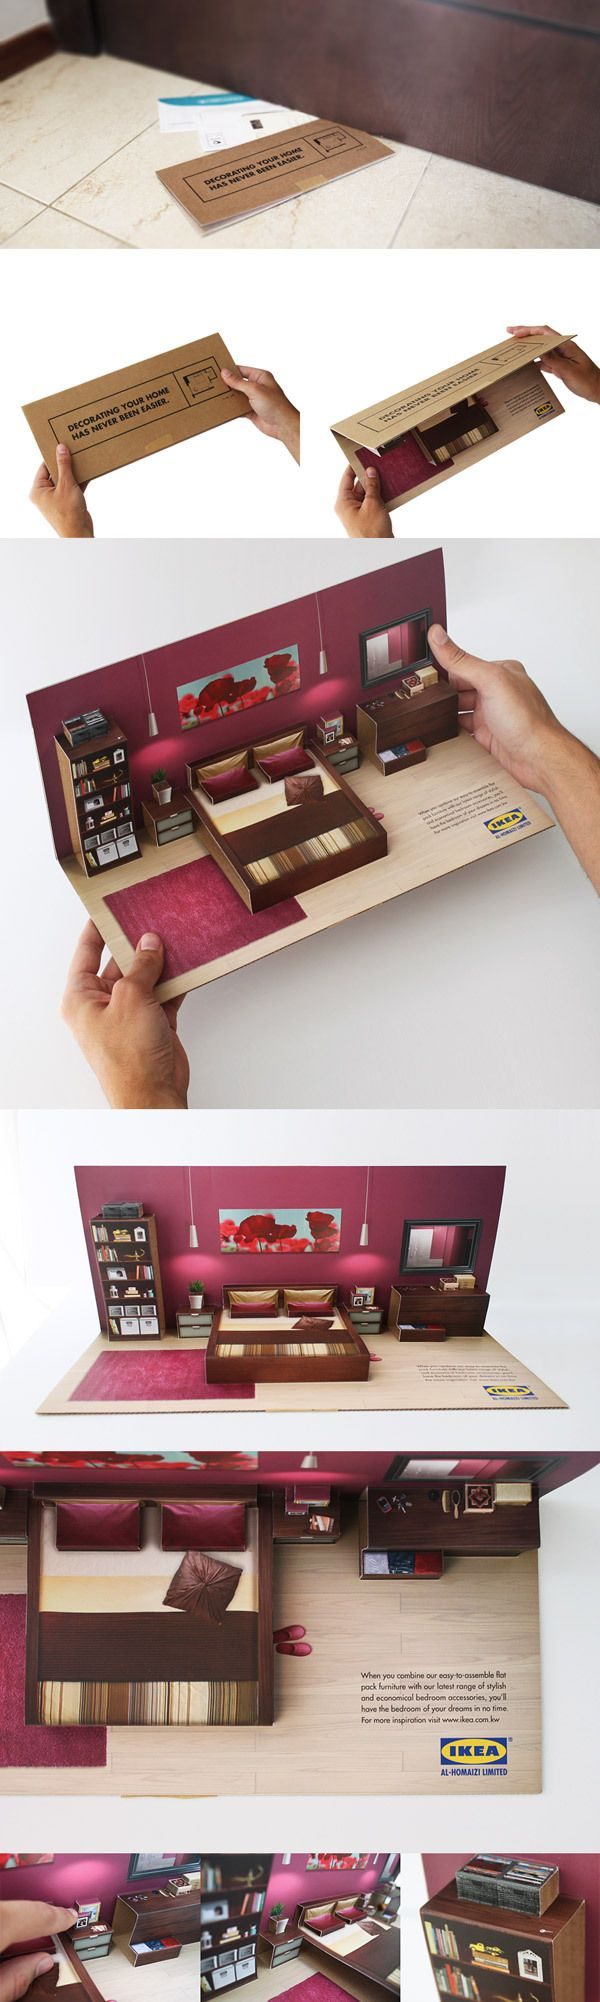 Ikea flat pack designs.